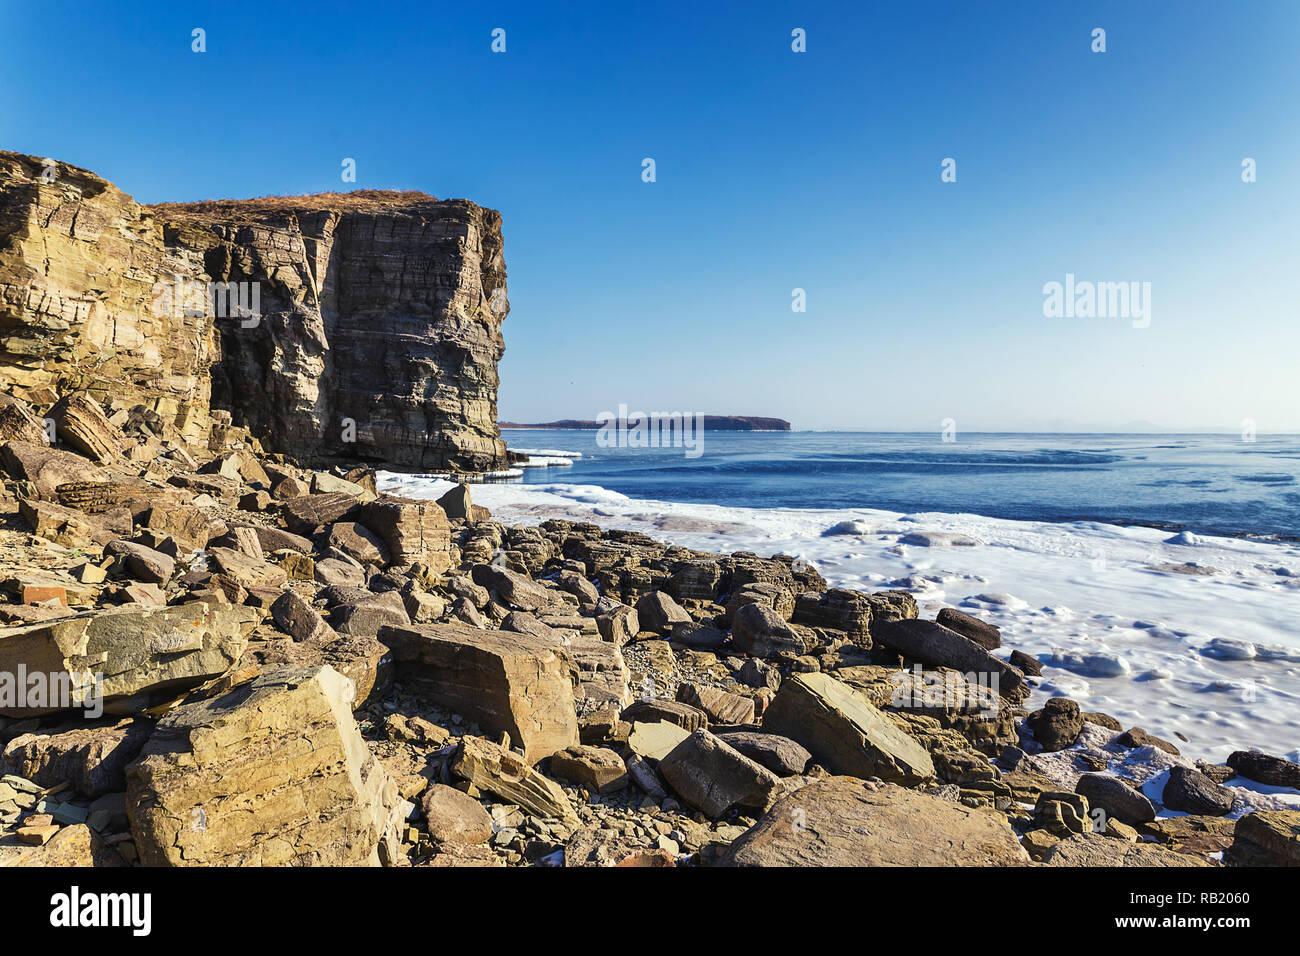 Rocky coast and high cliffs of Tobizin Cape in winter, Vladivostok, Russia - Stock Image